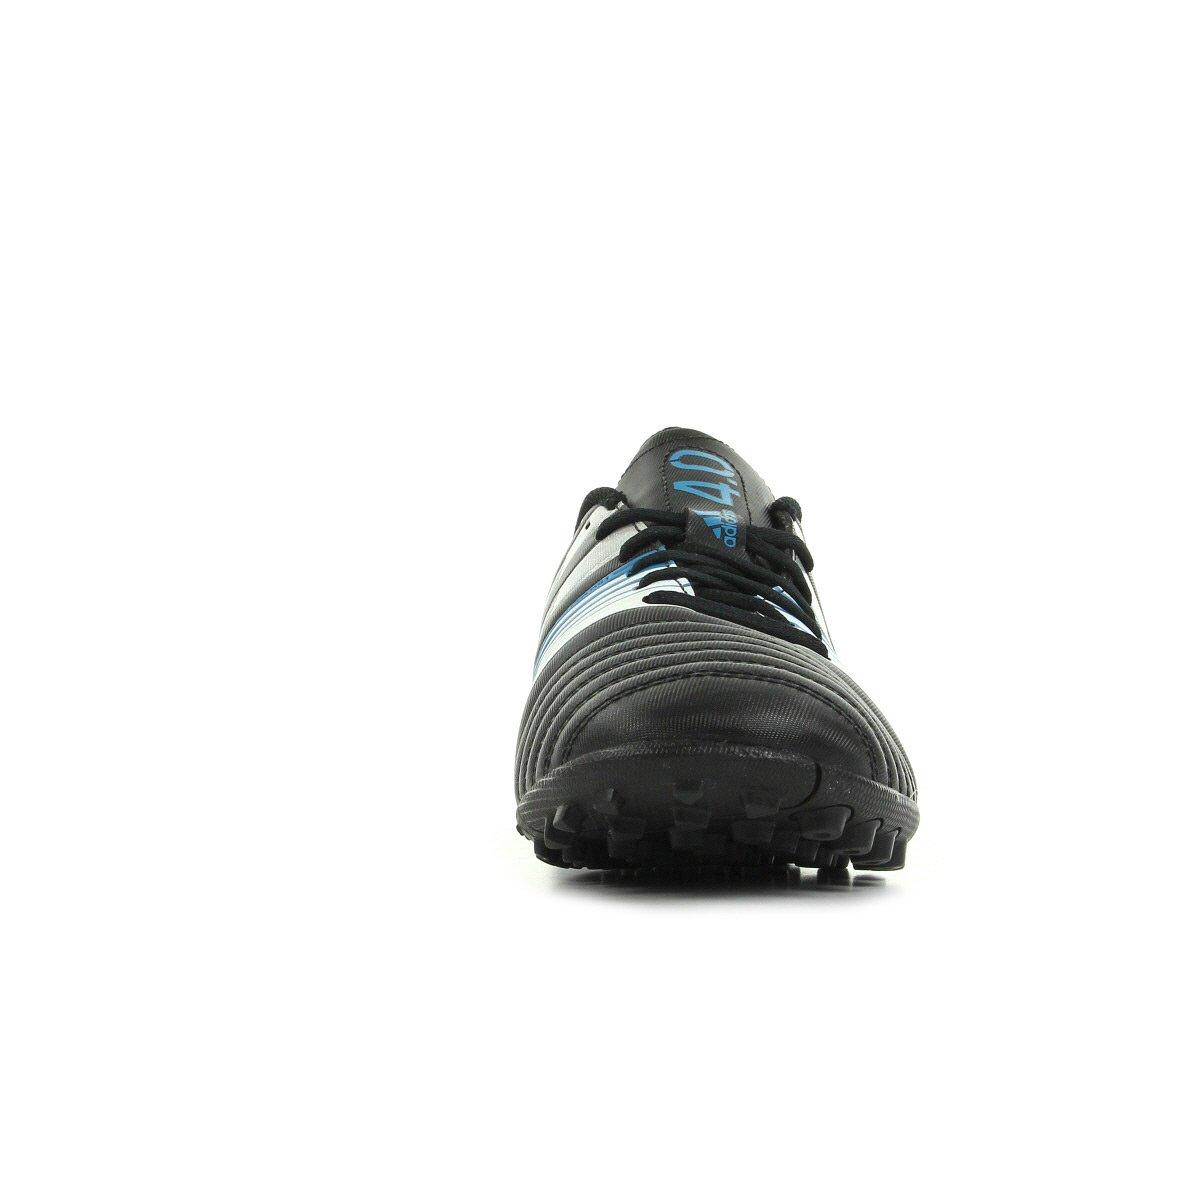 adidas Nitrocharge 4.0 TF AF4466, Chaussures football, Noir